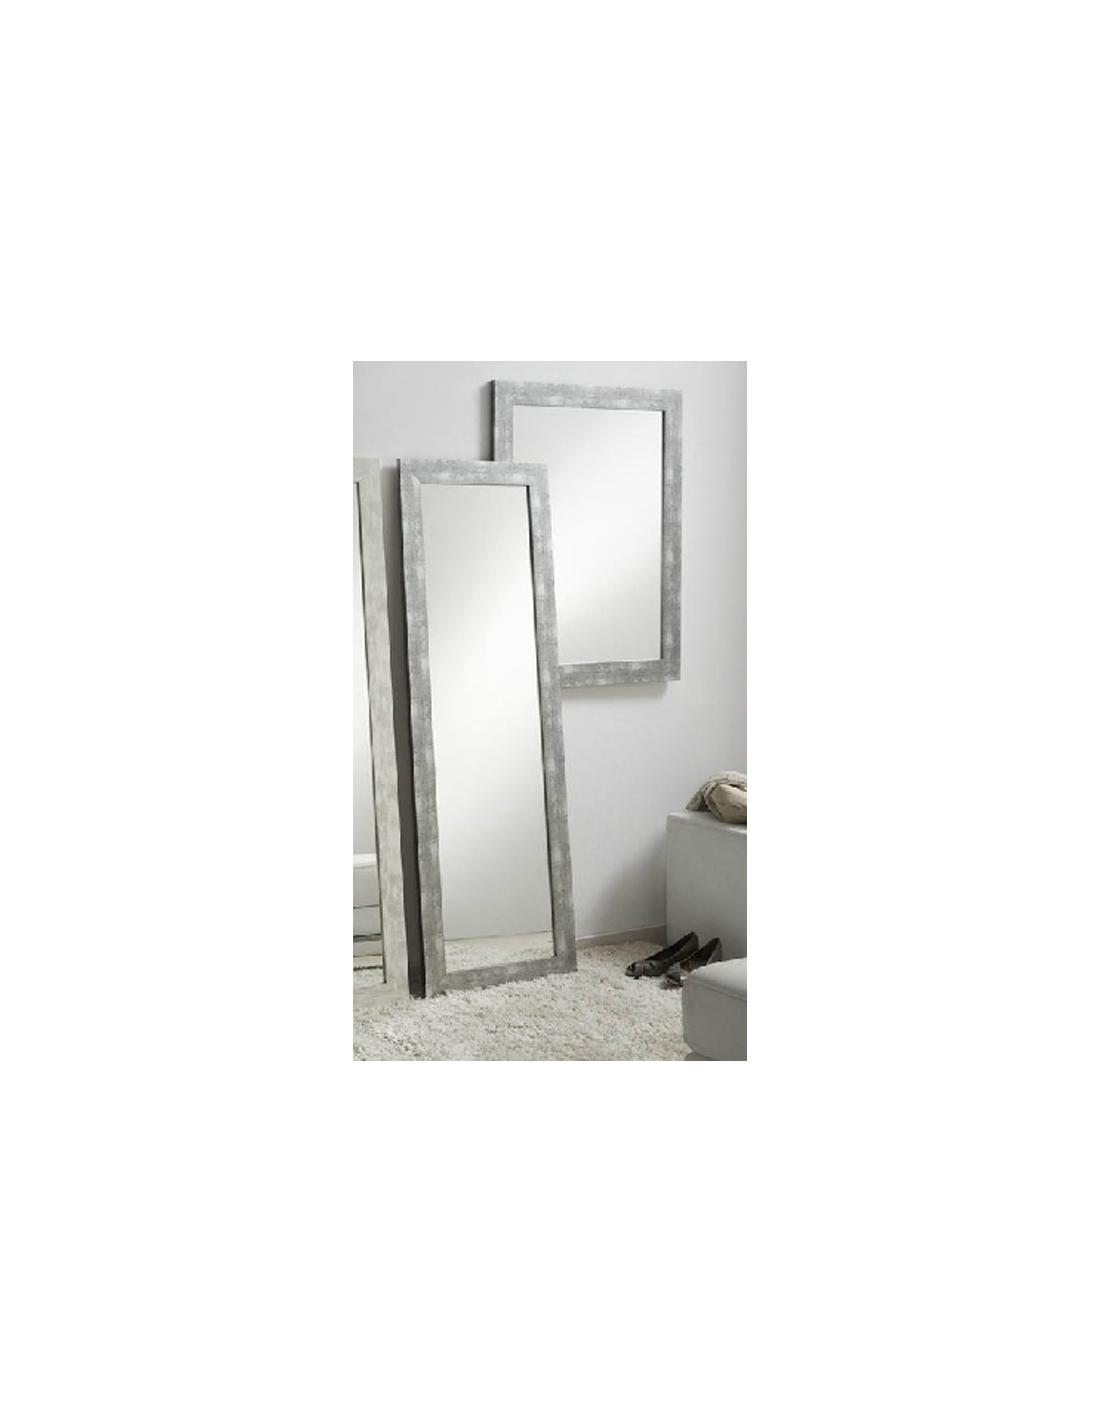 Comprar espejo decorativo madera decapado gris dos medidas for Espejos decorativos baratos